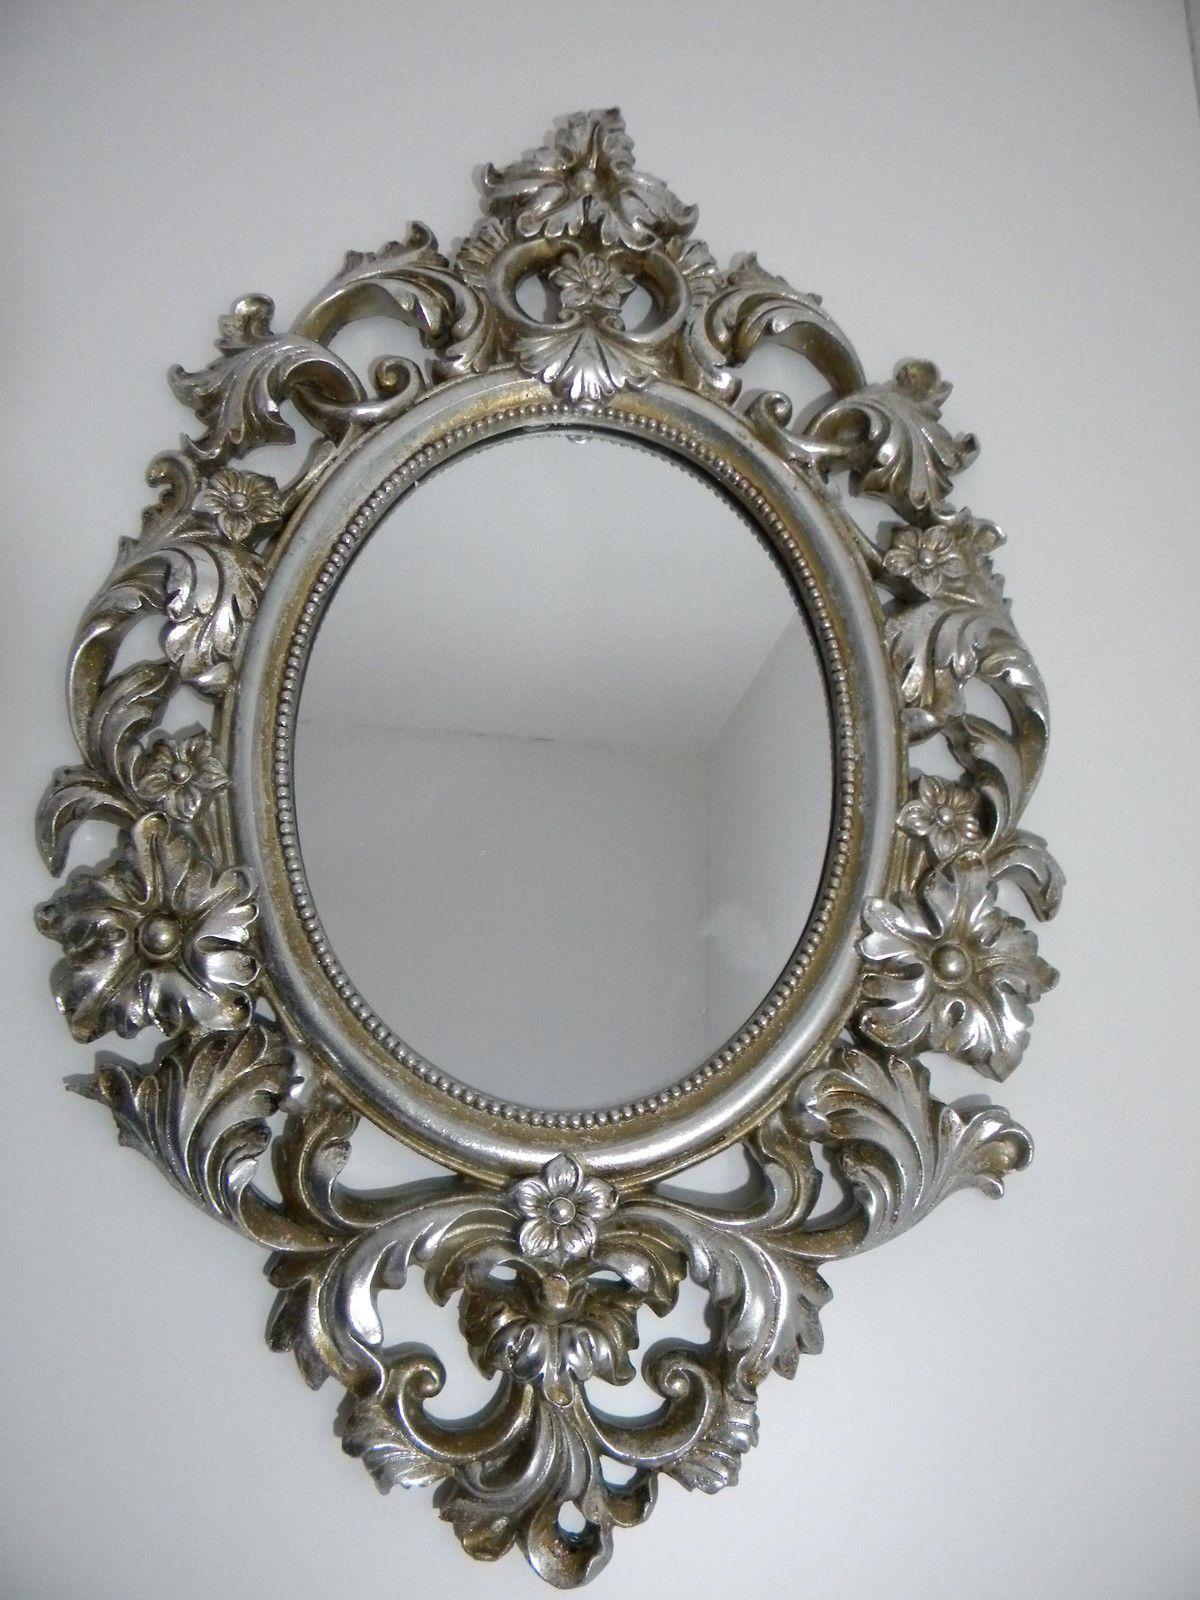 http://www.ebay.de/itm/Wandspiegel-Prunkspiegel-Ornament-verzierter ...